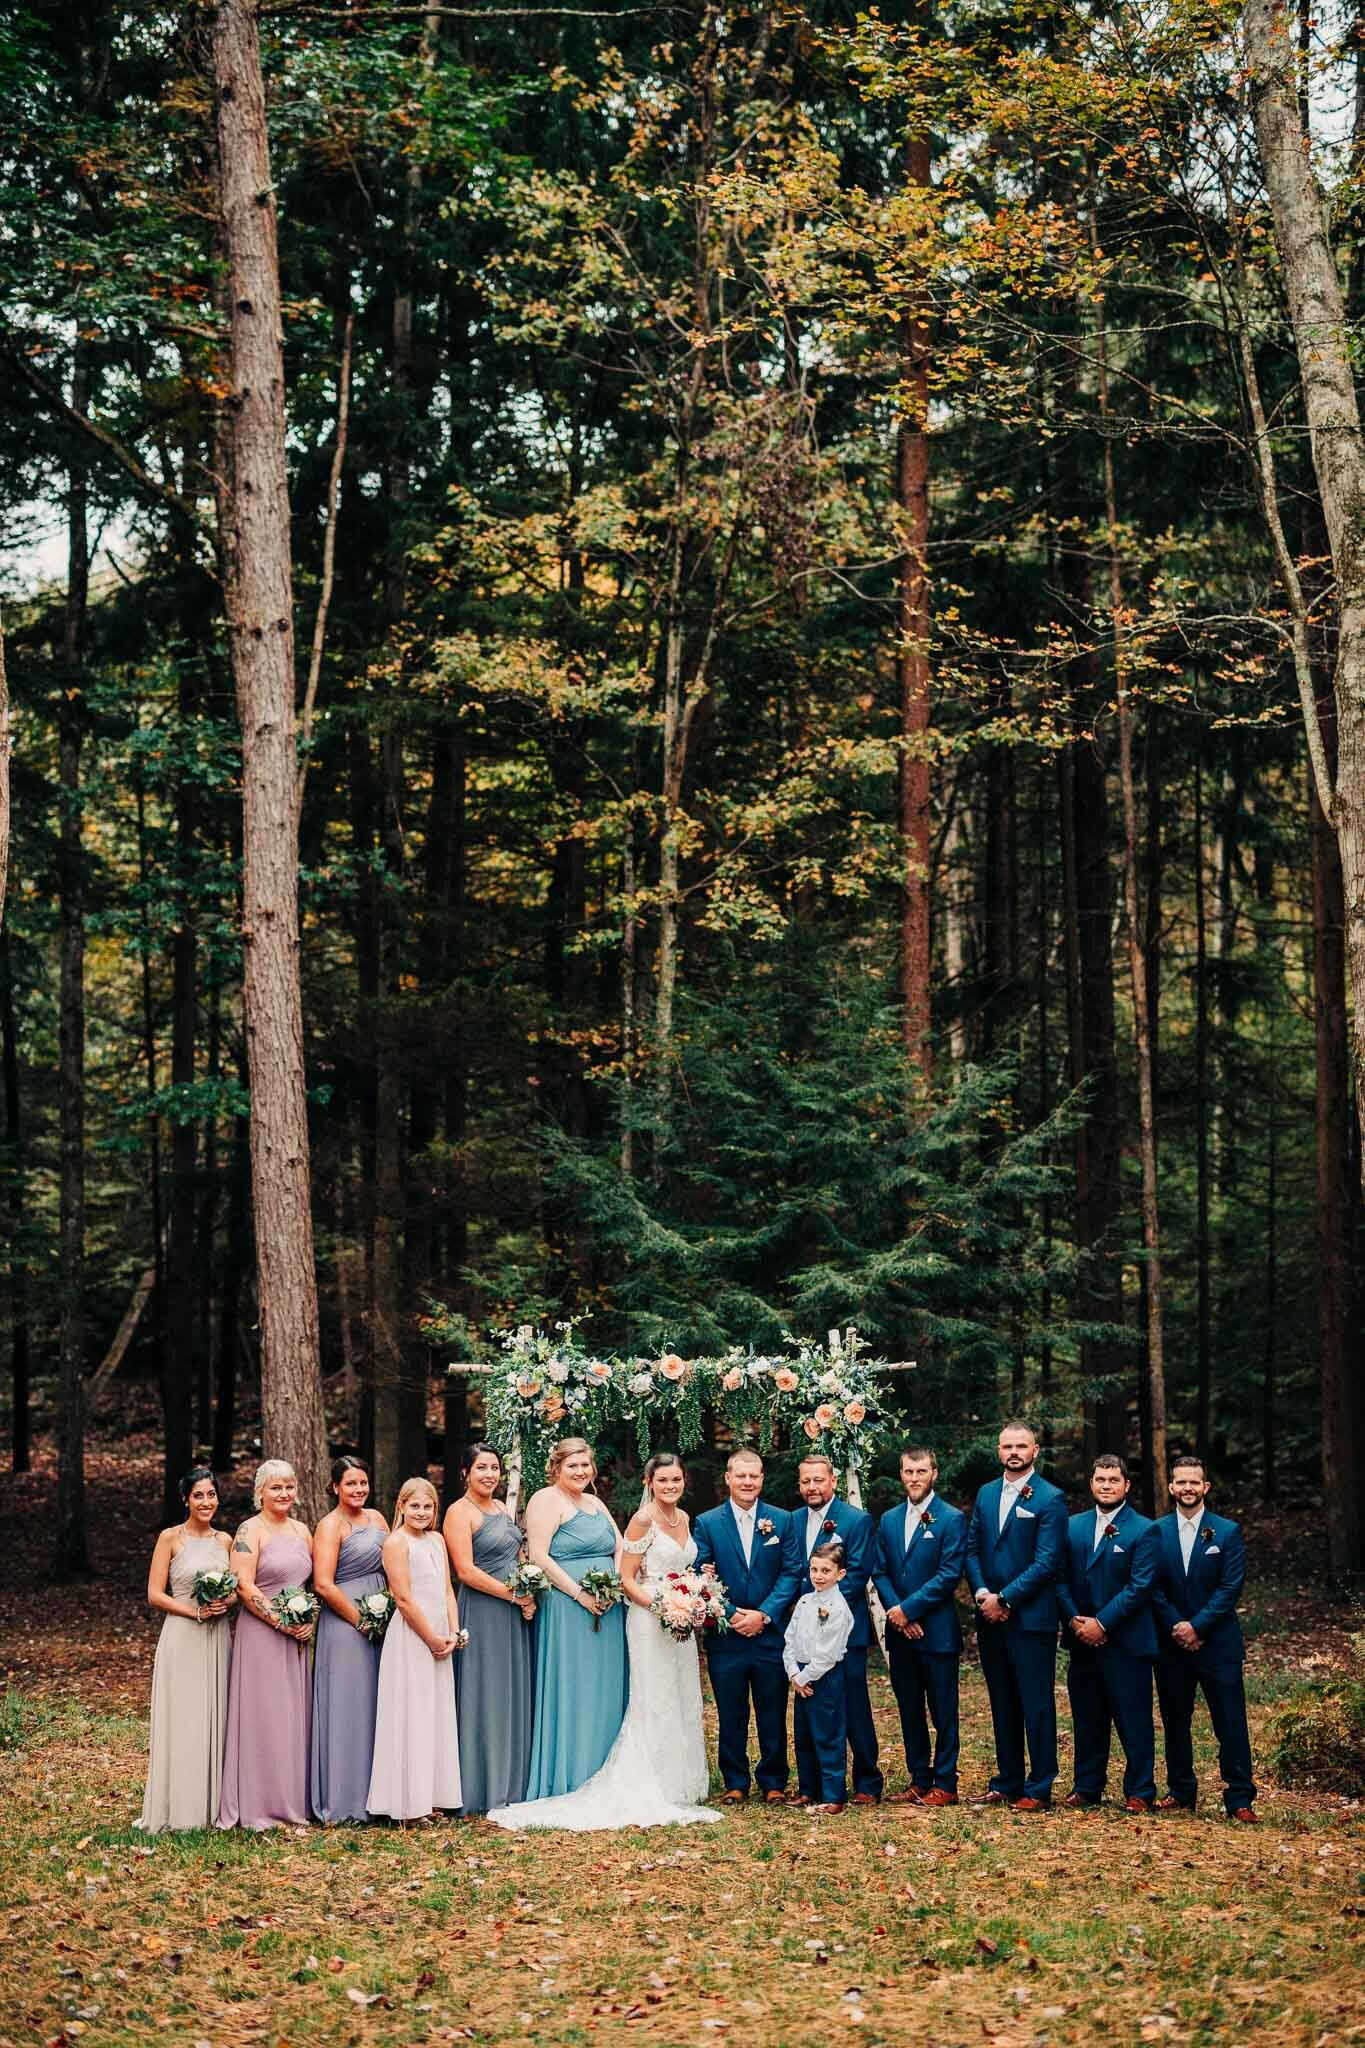 whitewoods-fall-wedding-8105.jpg